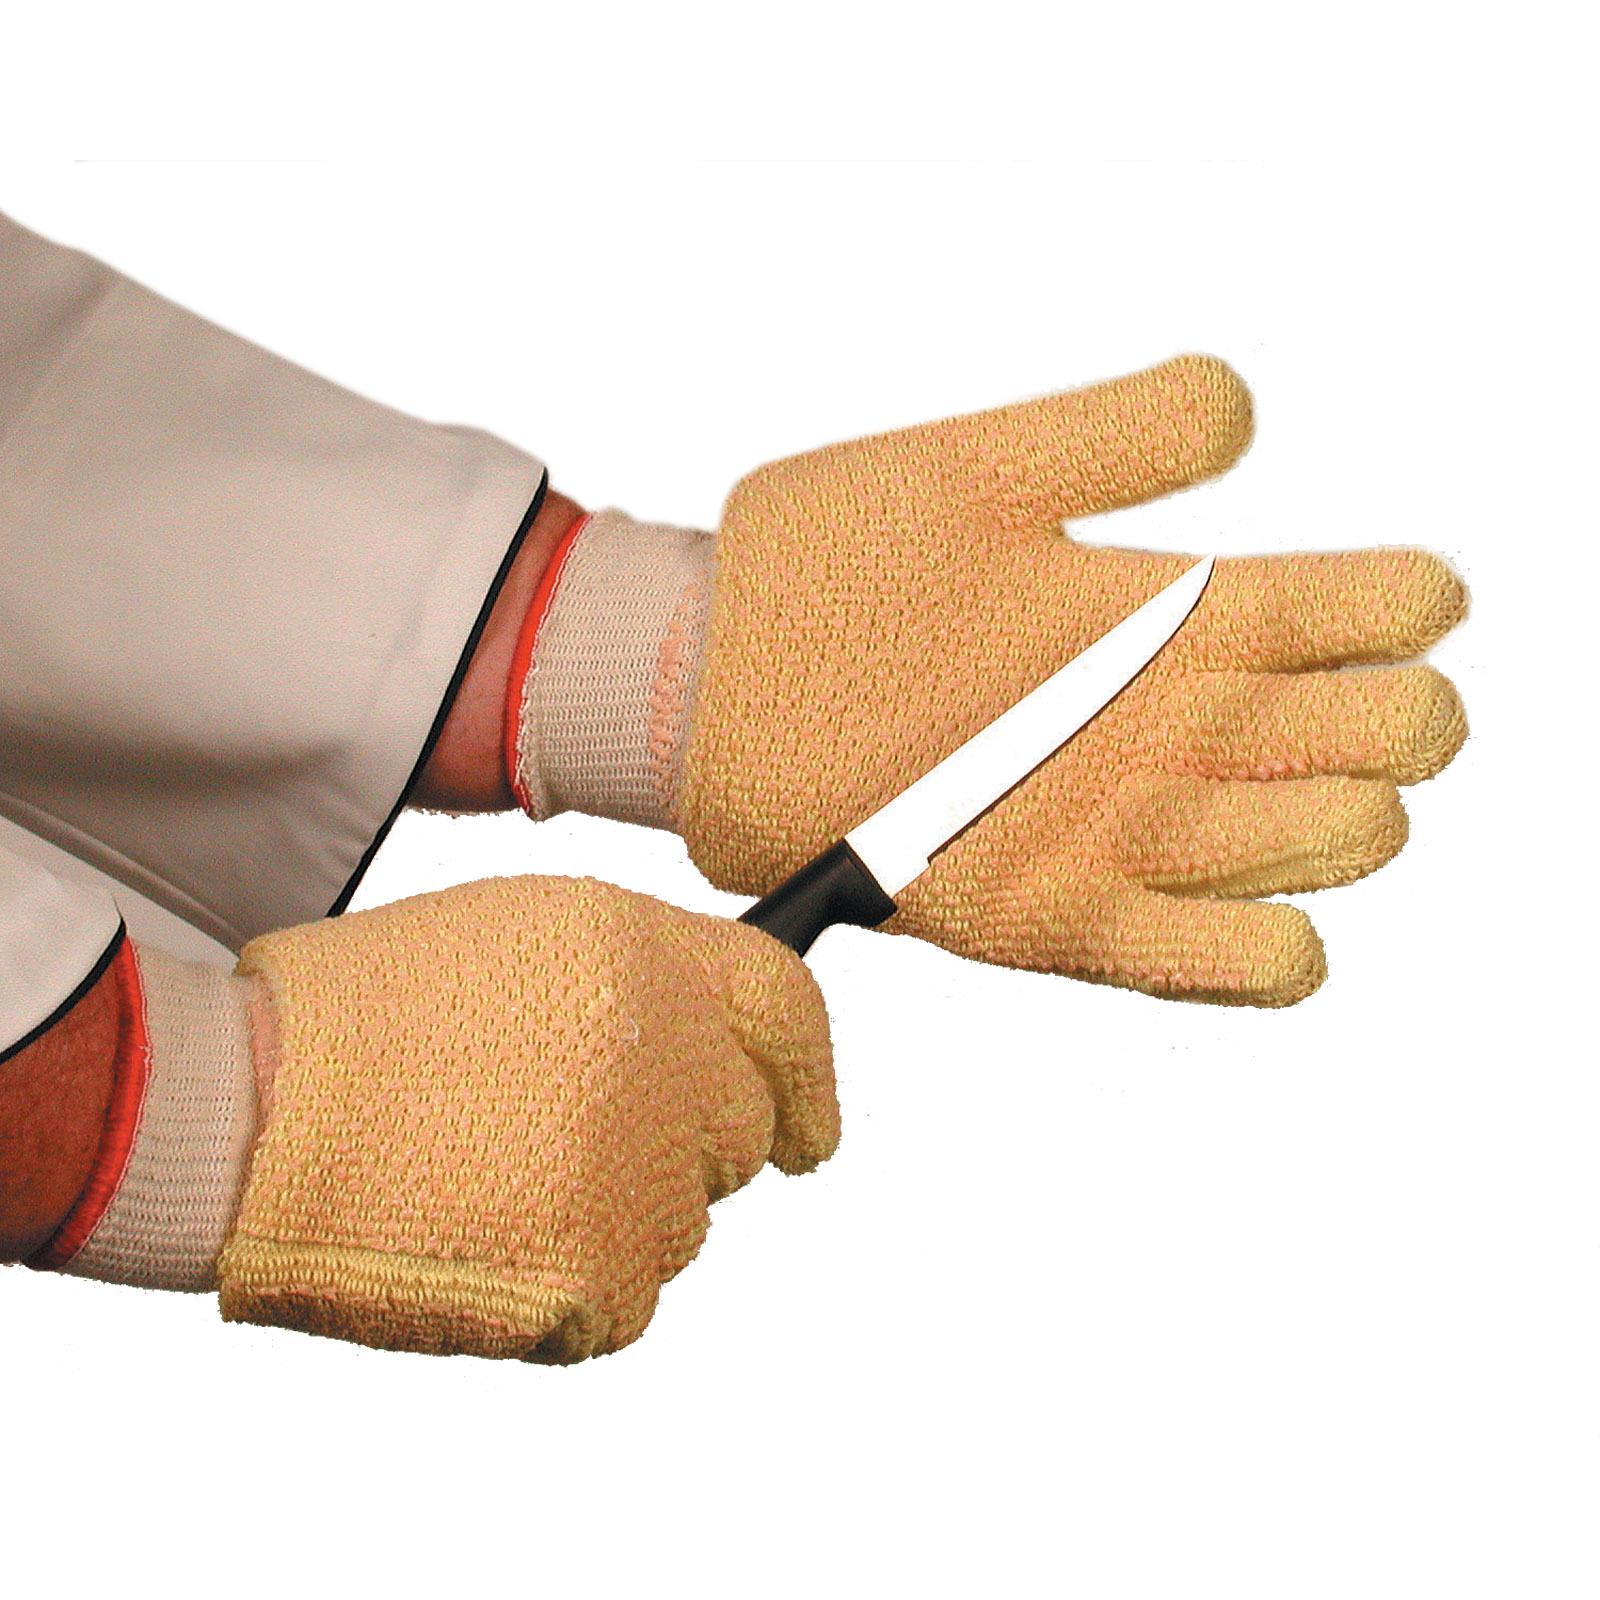 San Jamar KG1000 glove, cut resistant